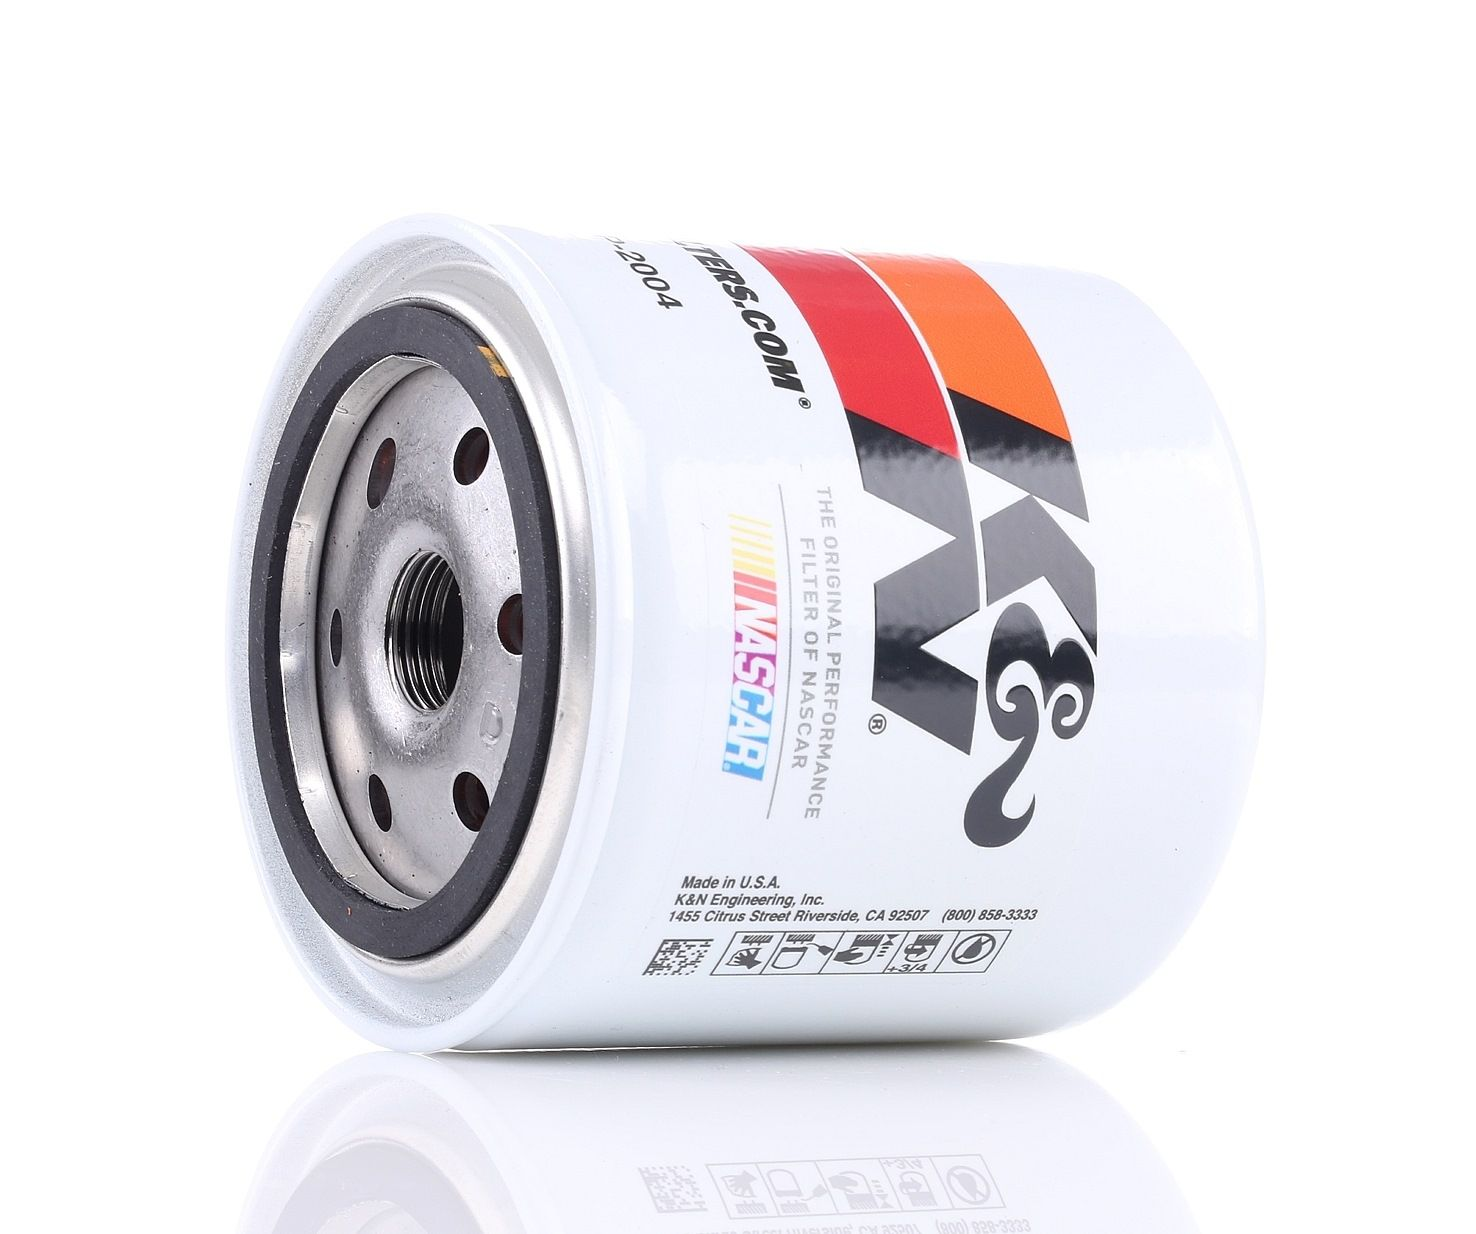 Origine Filtre à huile K&N Filters HP-2004 (Ø: 93mm, Ø: 93mm, Hauteur: 102mm)